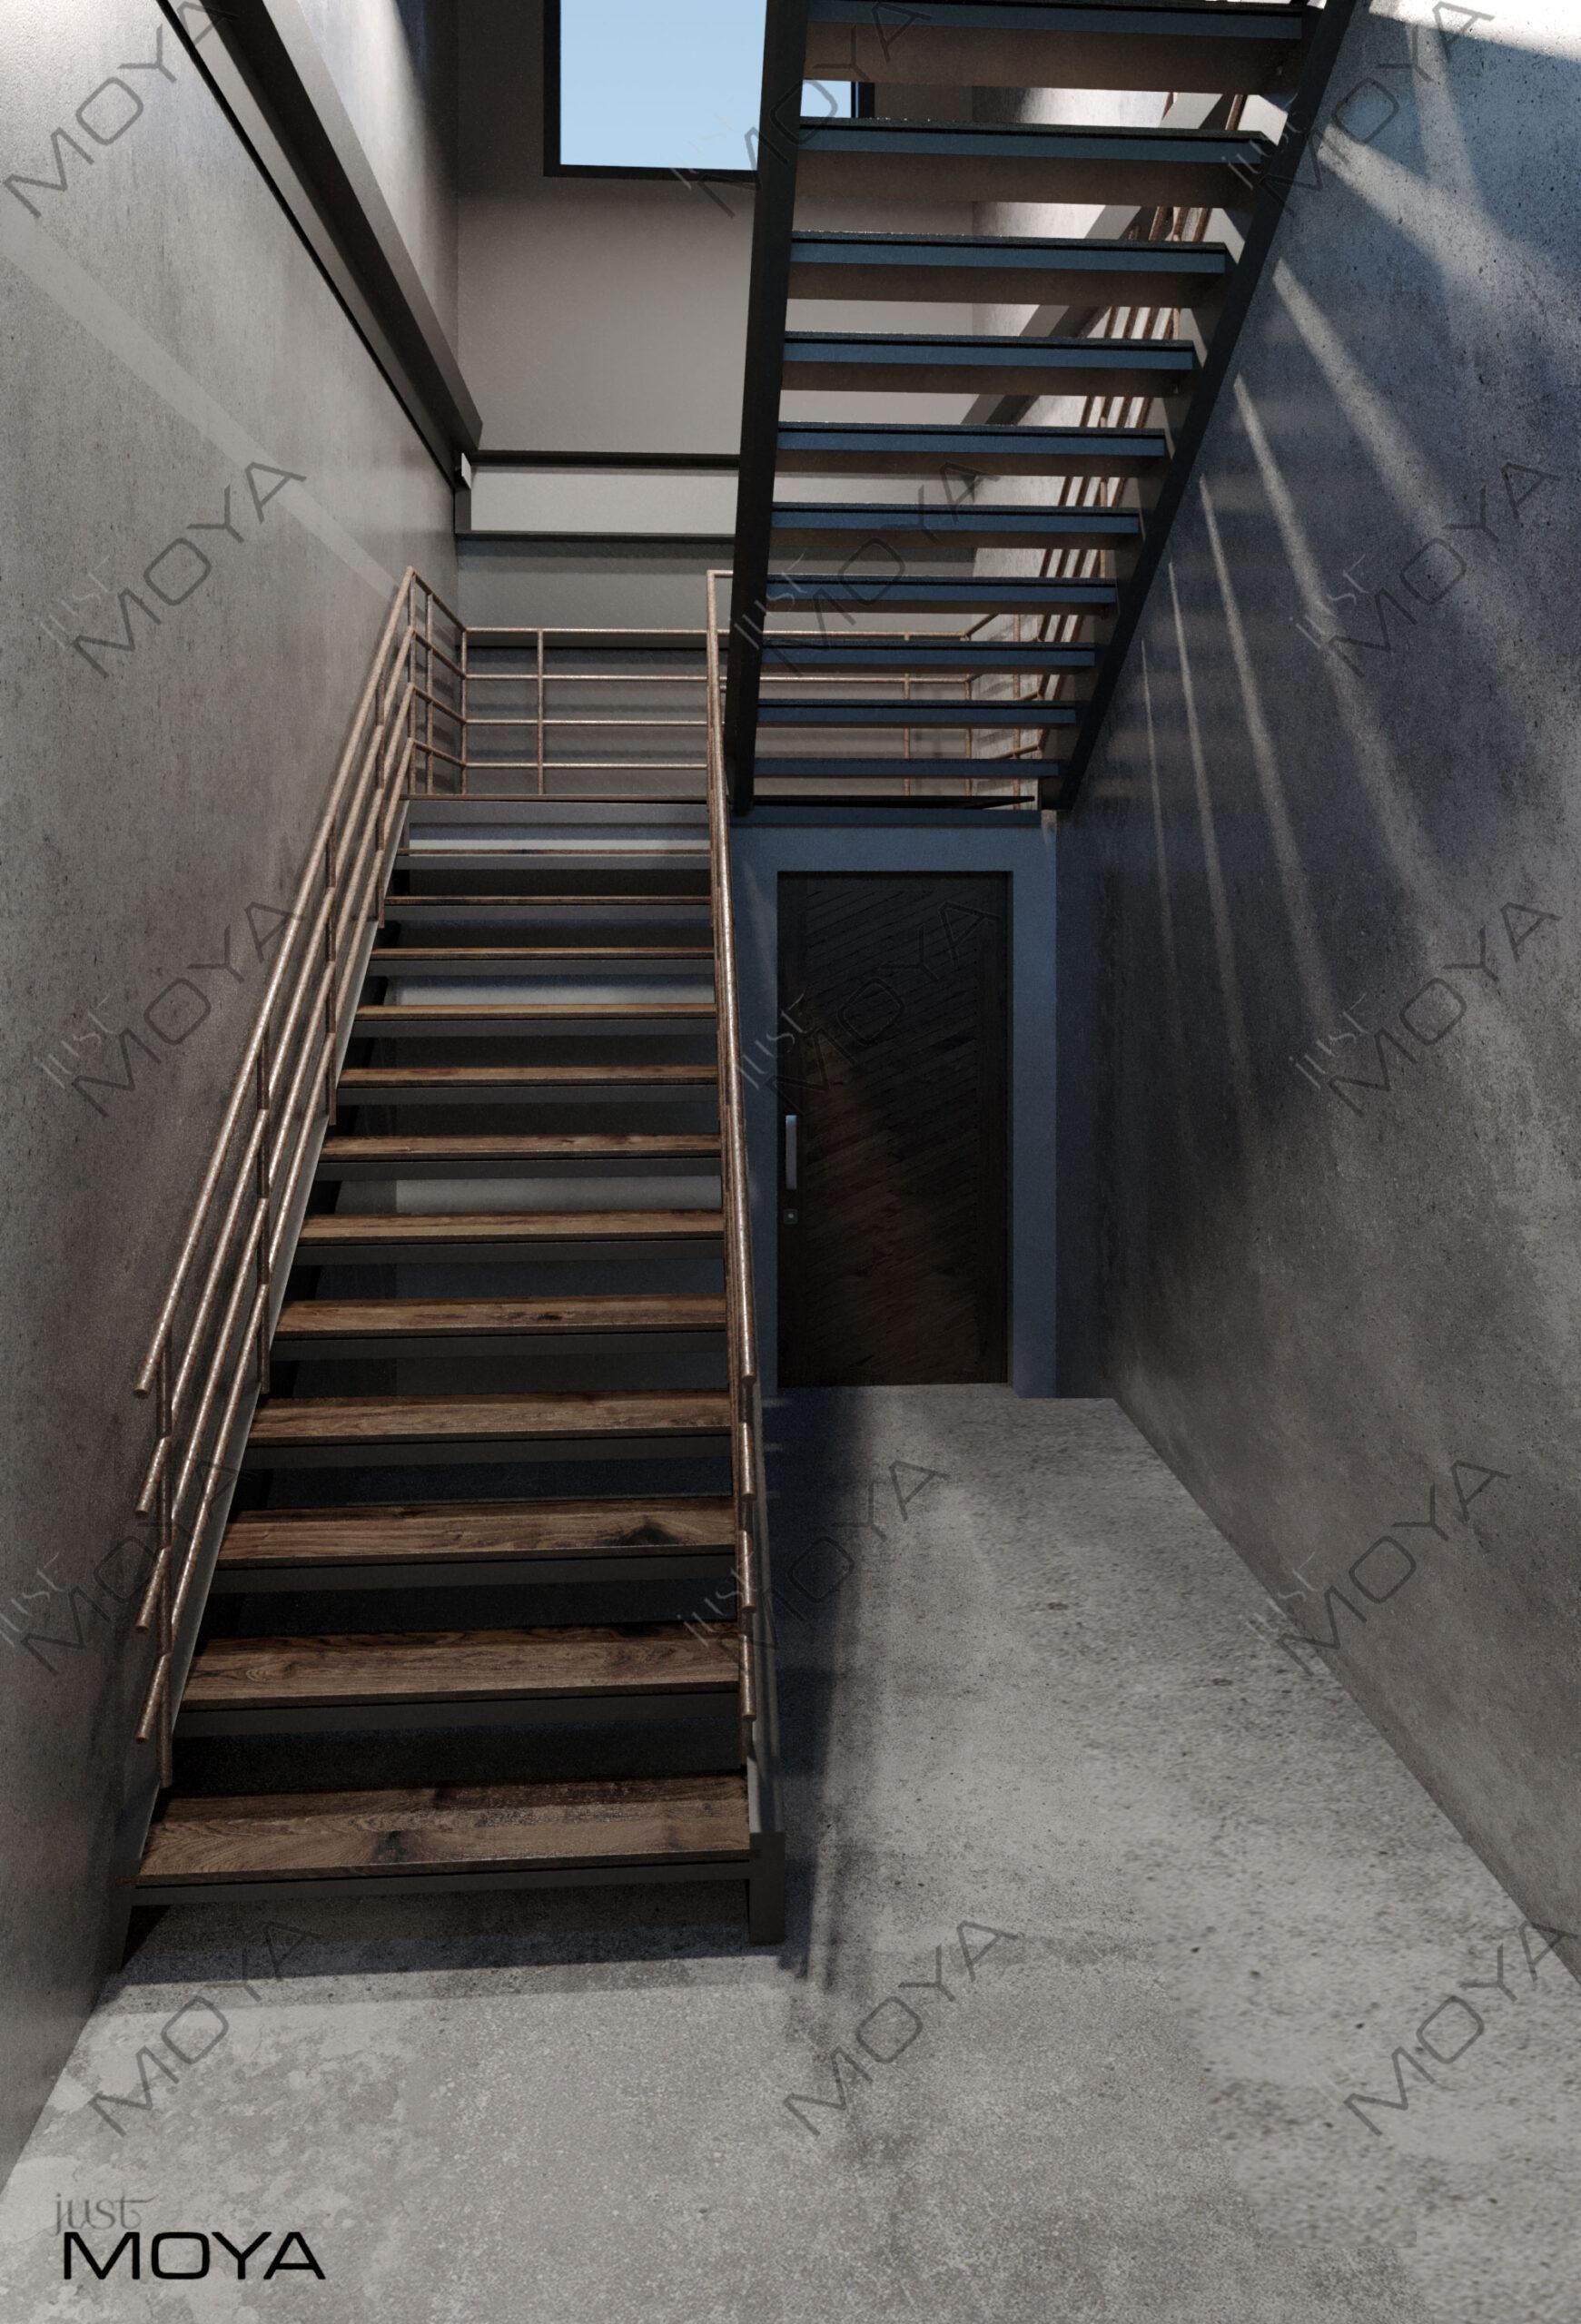 STAIRS-SCENE_WOOD-COATING-JUST-MOYA